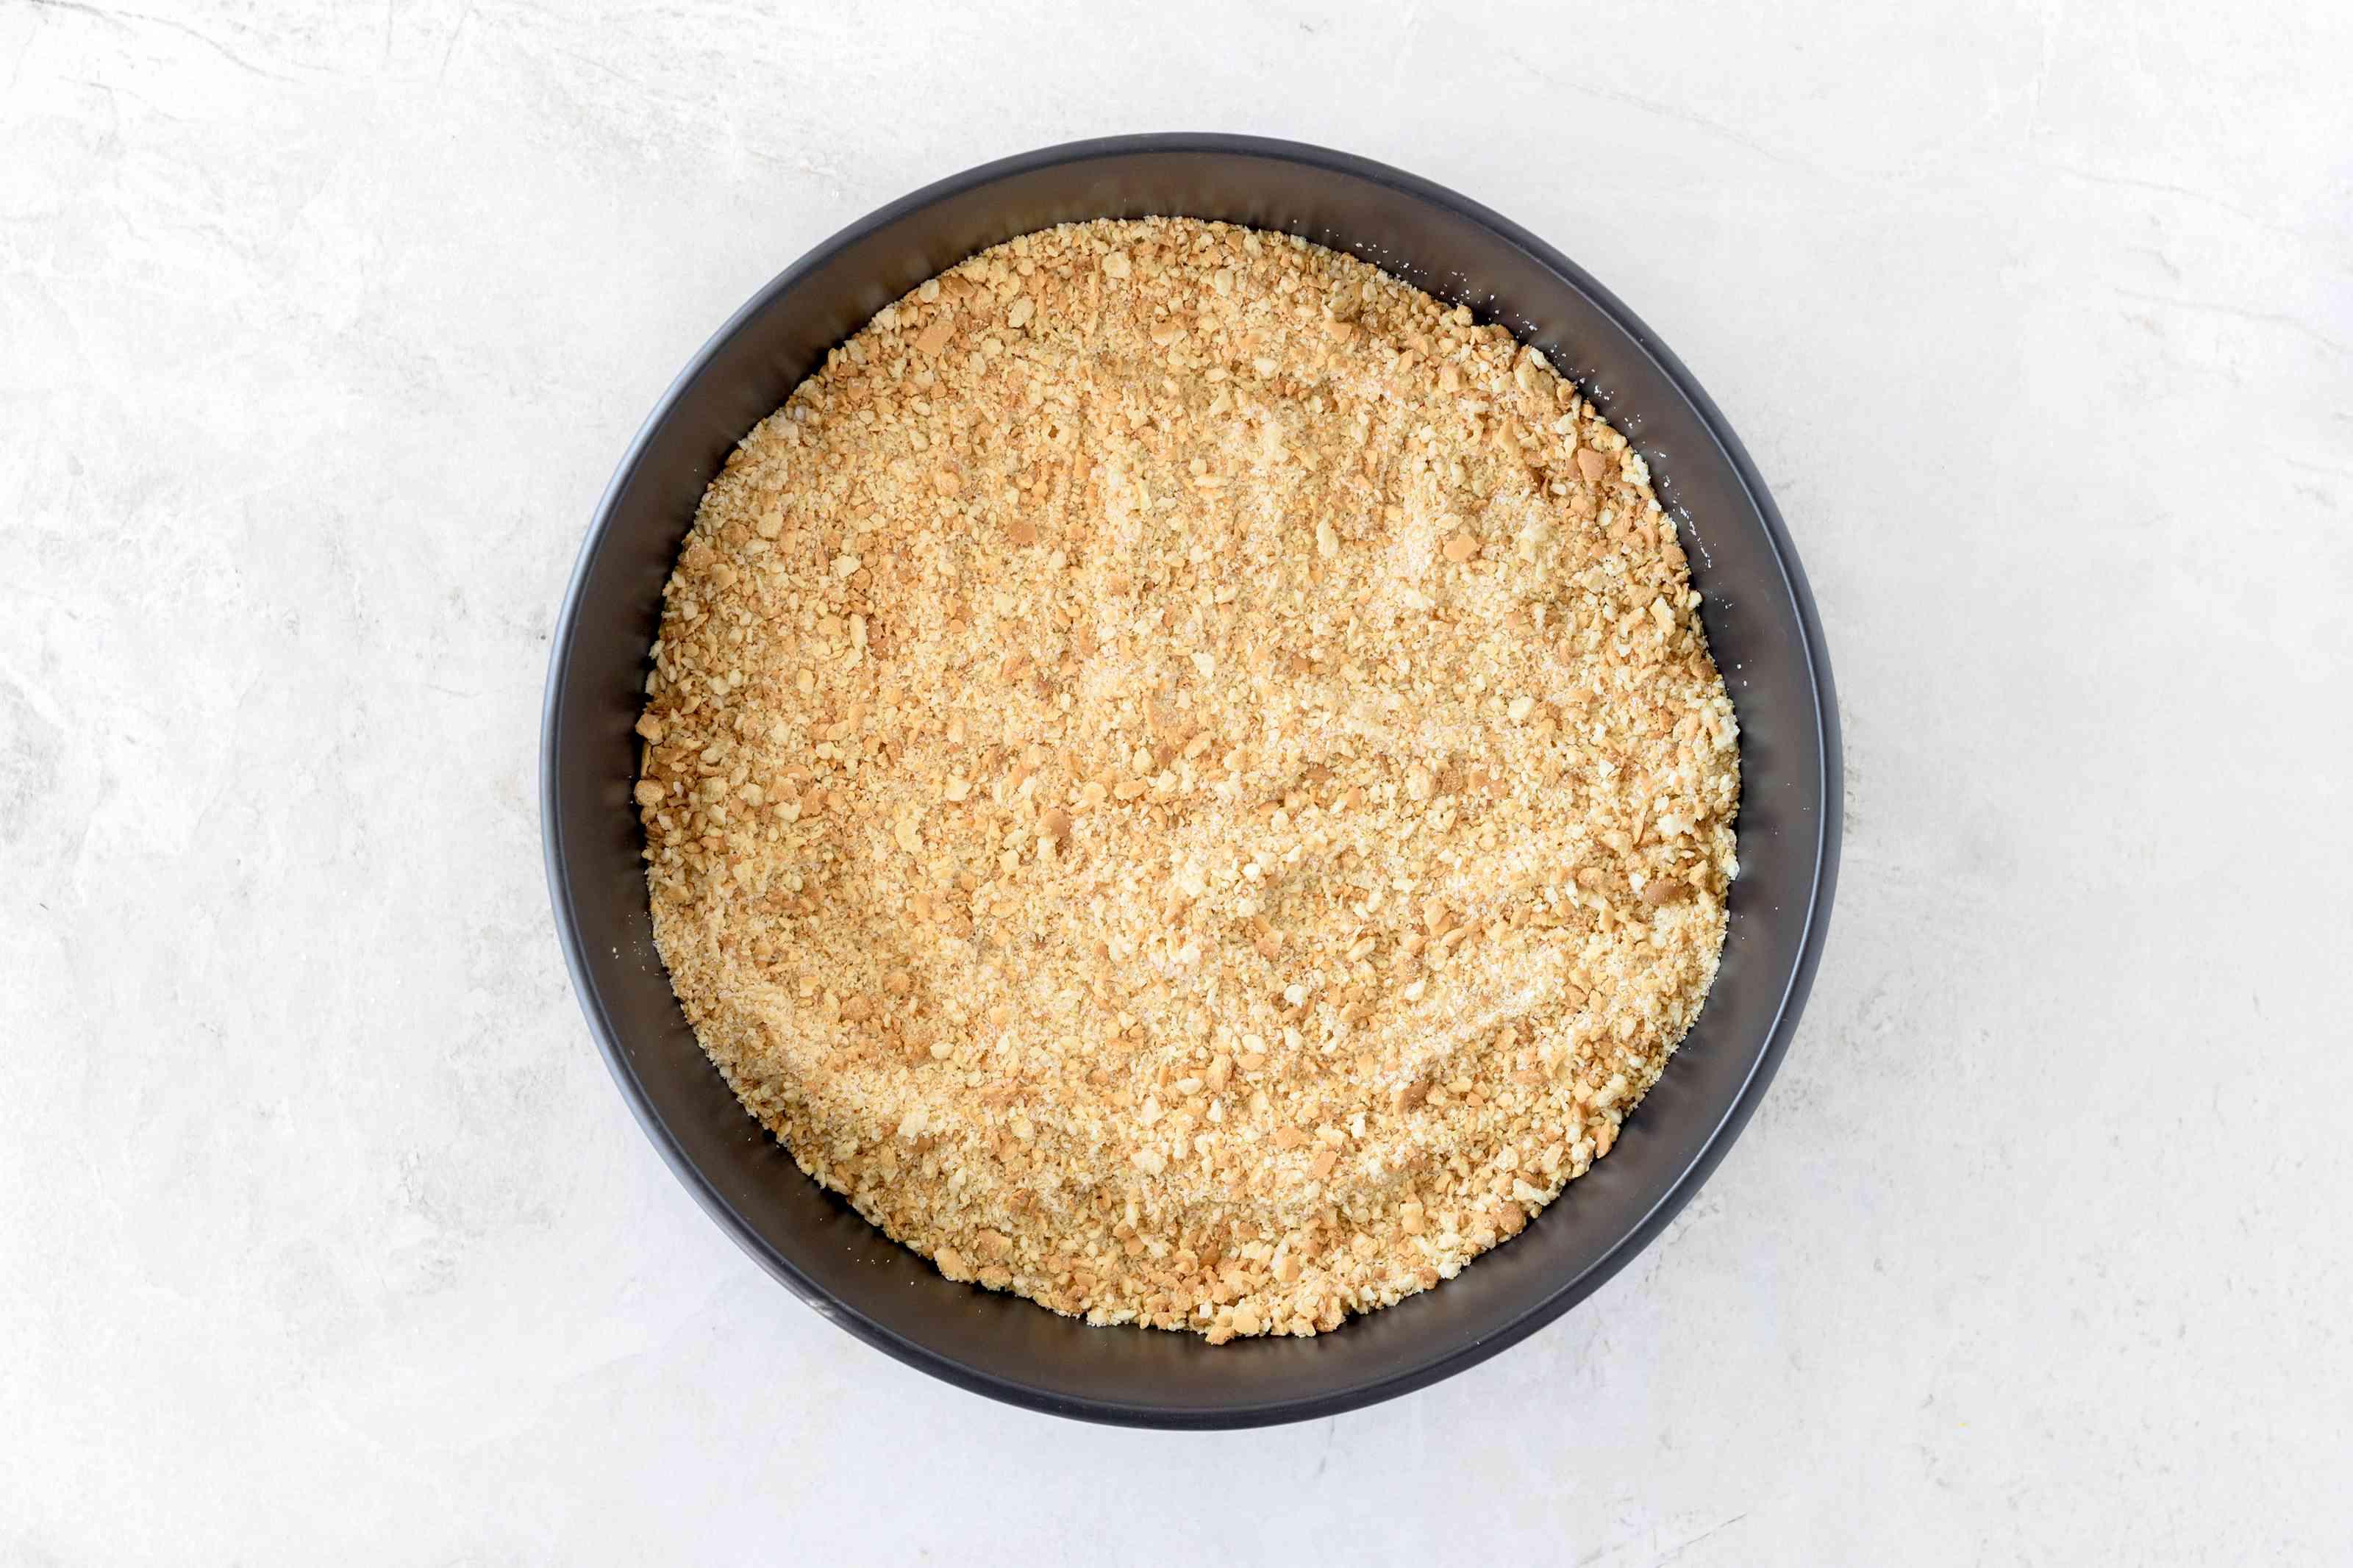 Graham cracker crumbs and sugar in bowl